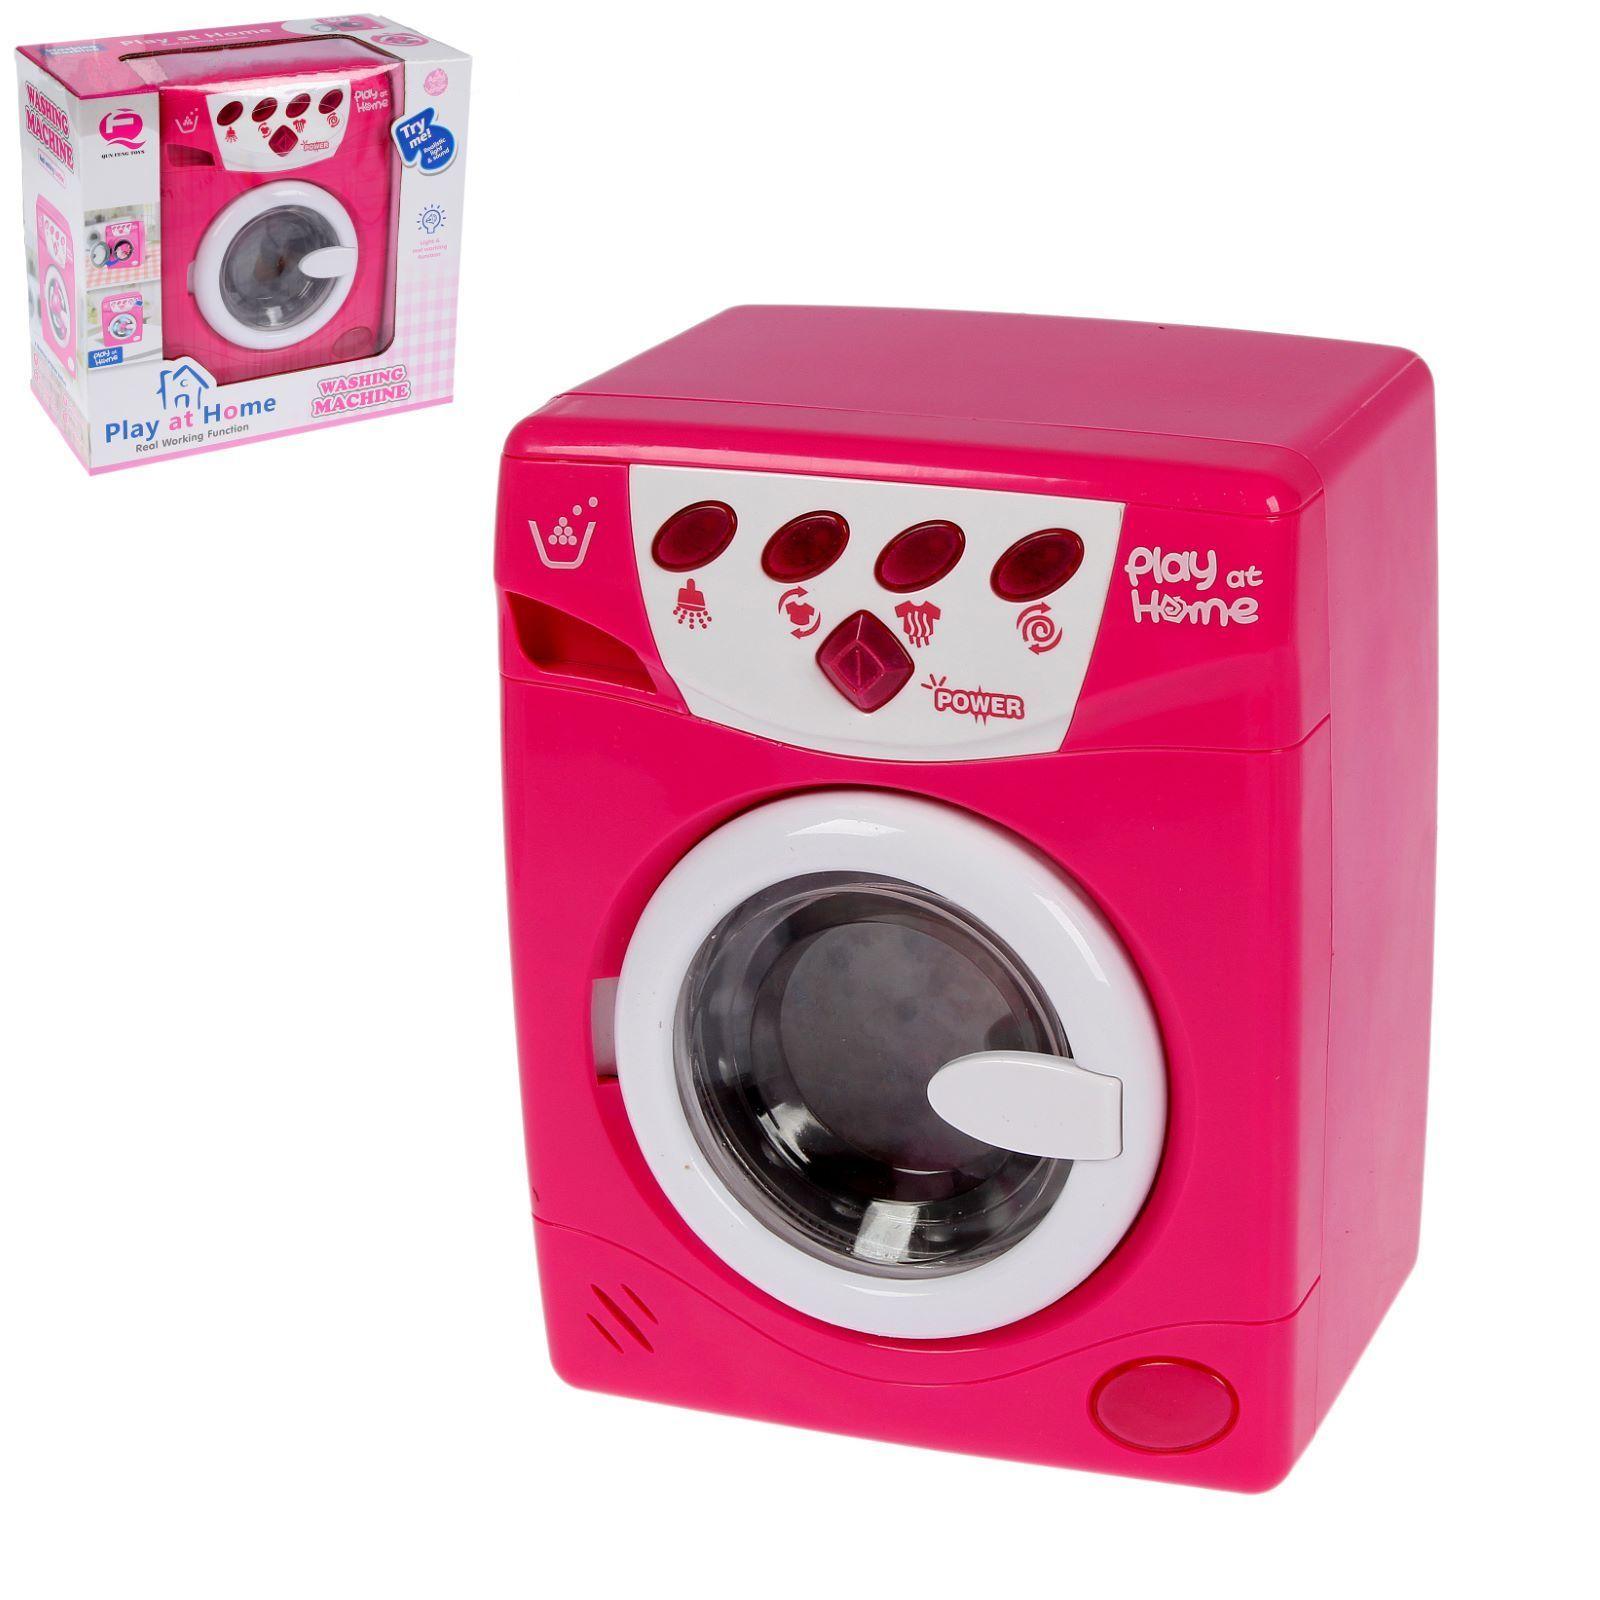 Игрушечная стиральная машина Play At Home (свет, звук)